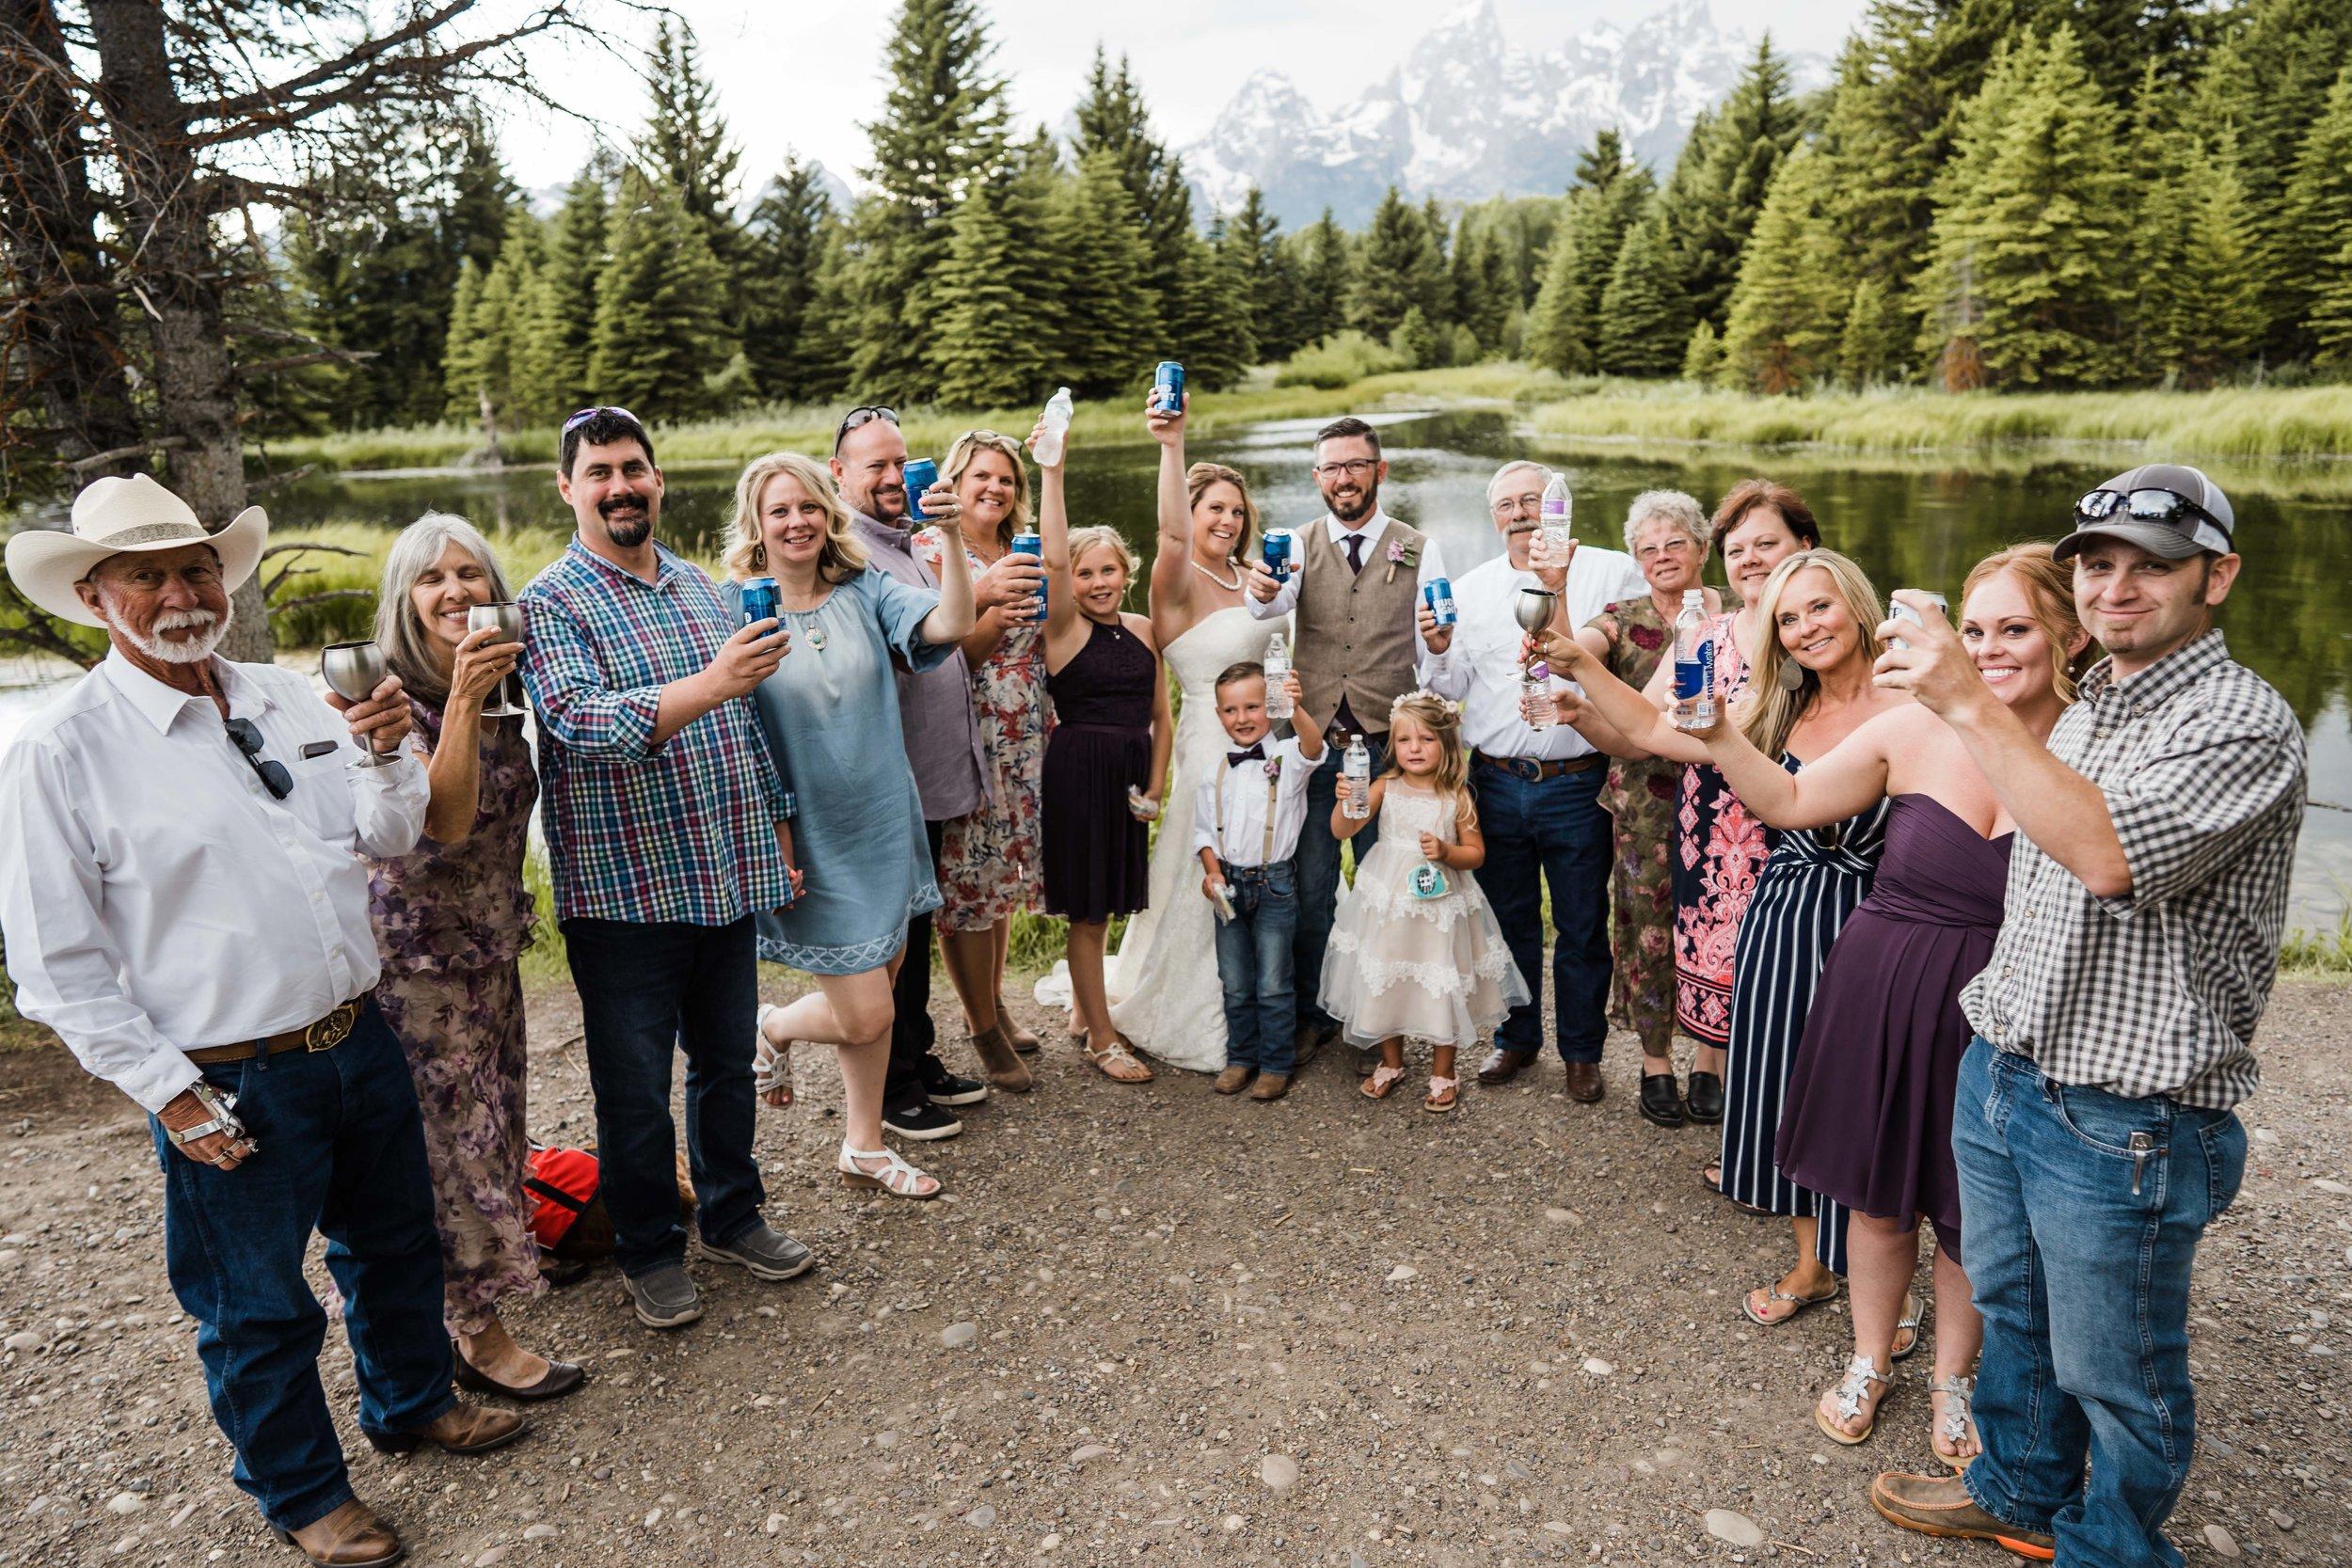 jackson hole adventure wedding photography at schwabachers landing in GTNP -DSD01840.jpg